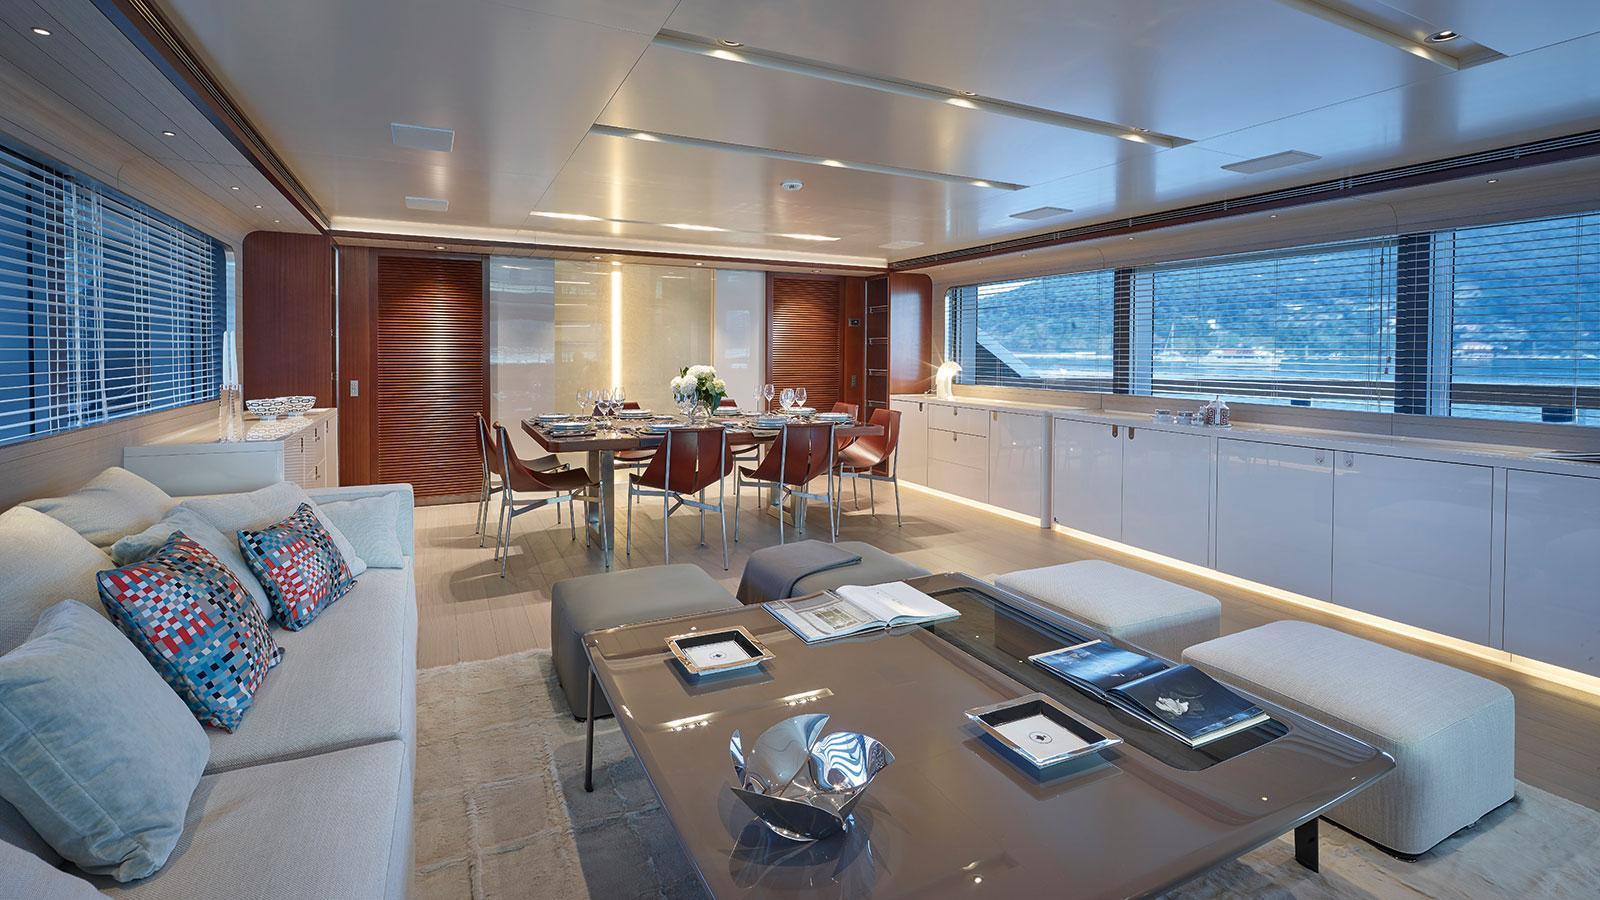 moka-expedition-motor-yacht-sanlorenzo-460-exp-2015-42m-main-saloon